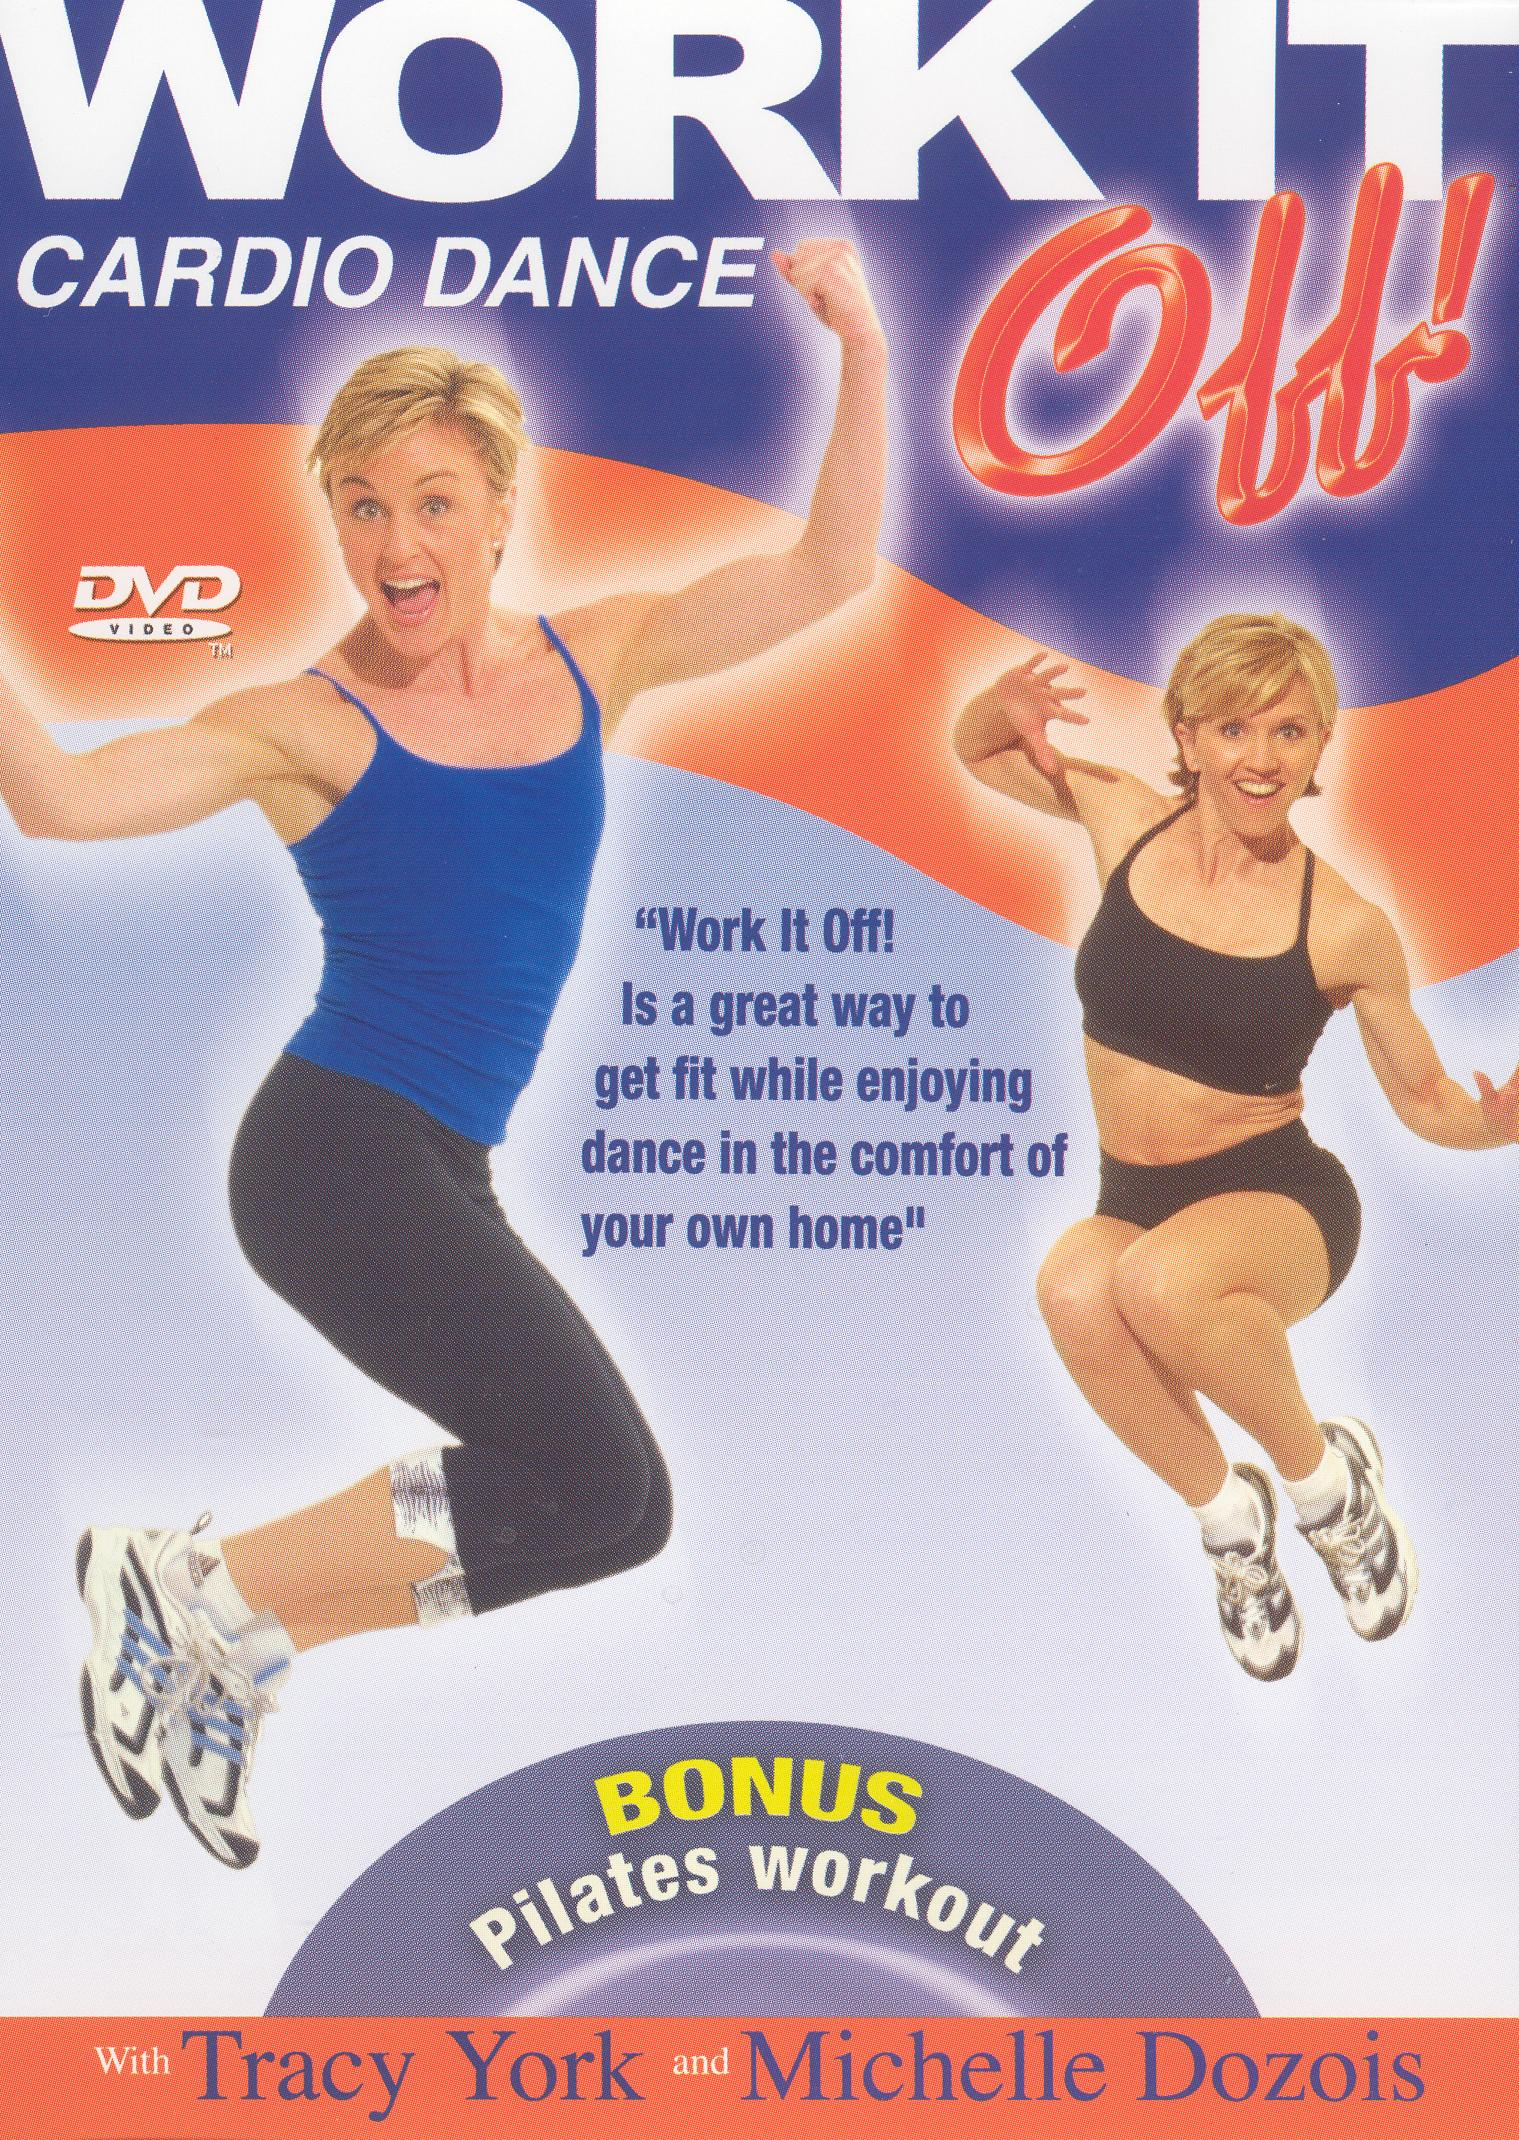 Work It Off: Cardio Dance